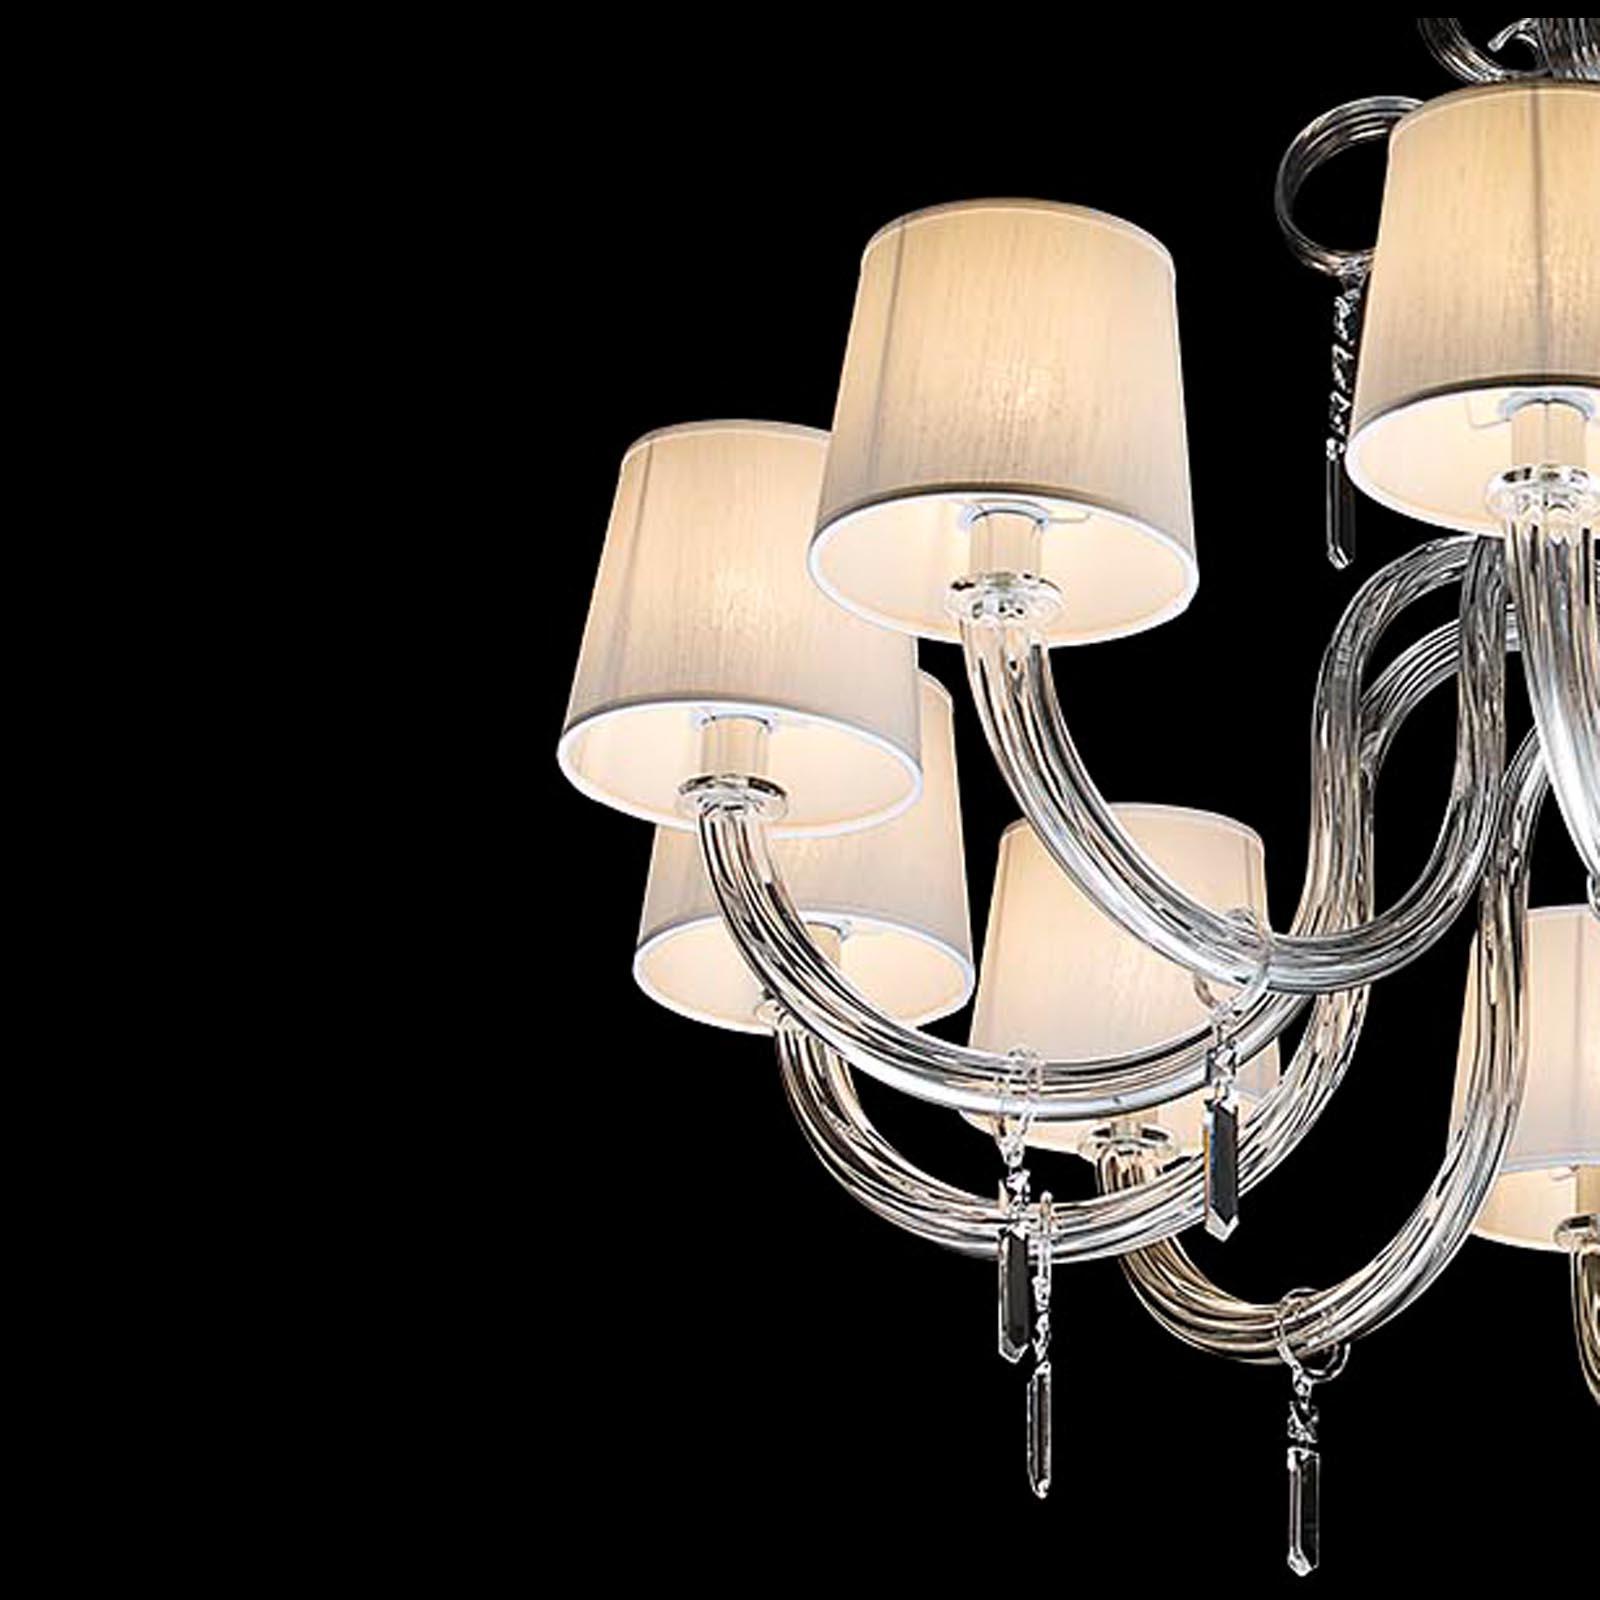 Gritti modern chandelier Murano blown glass